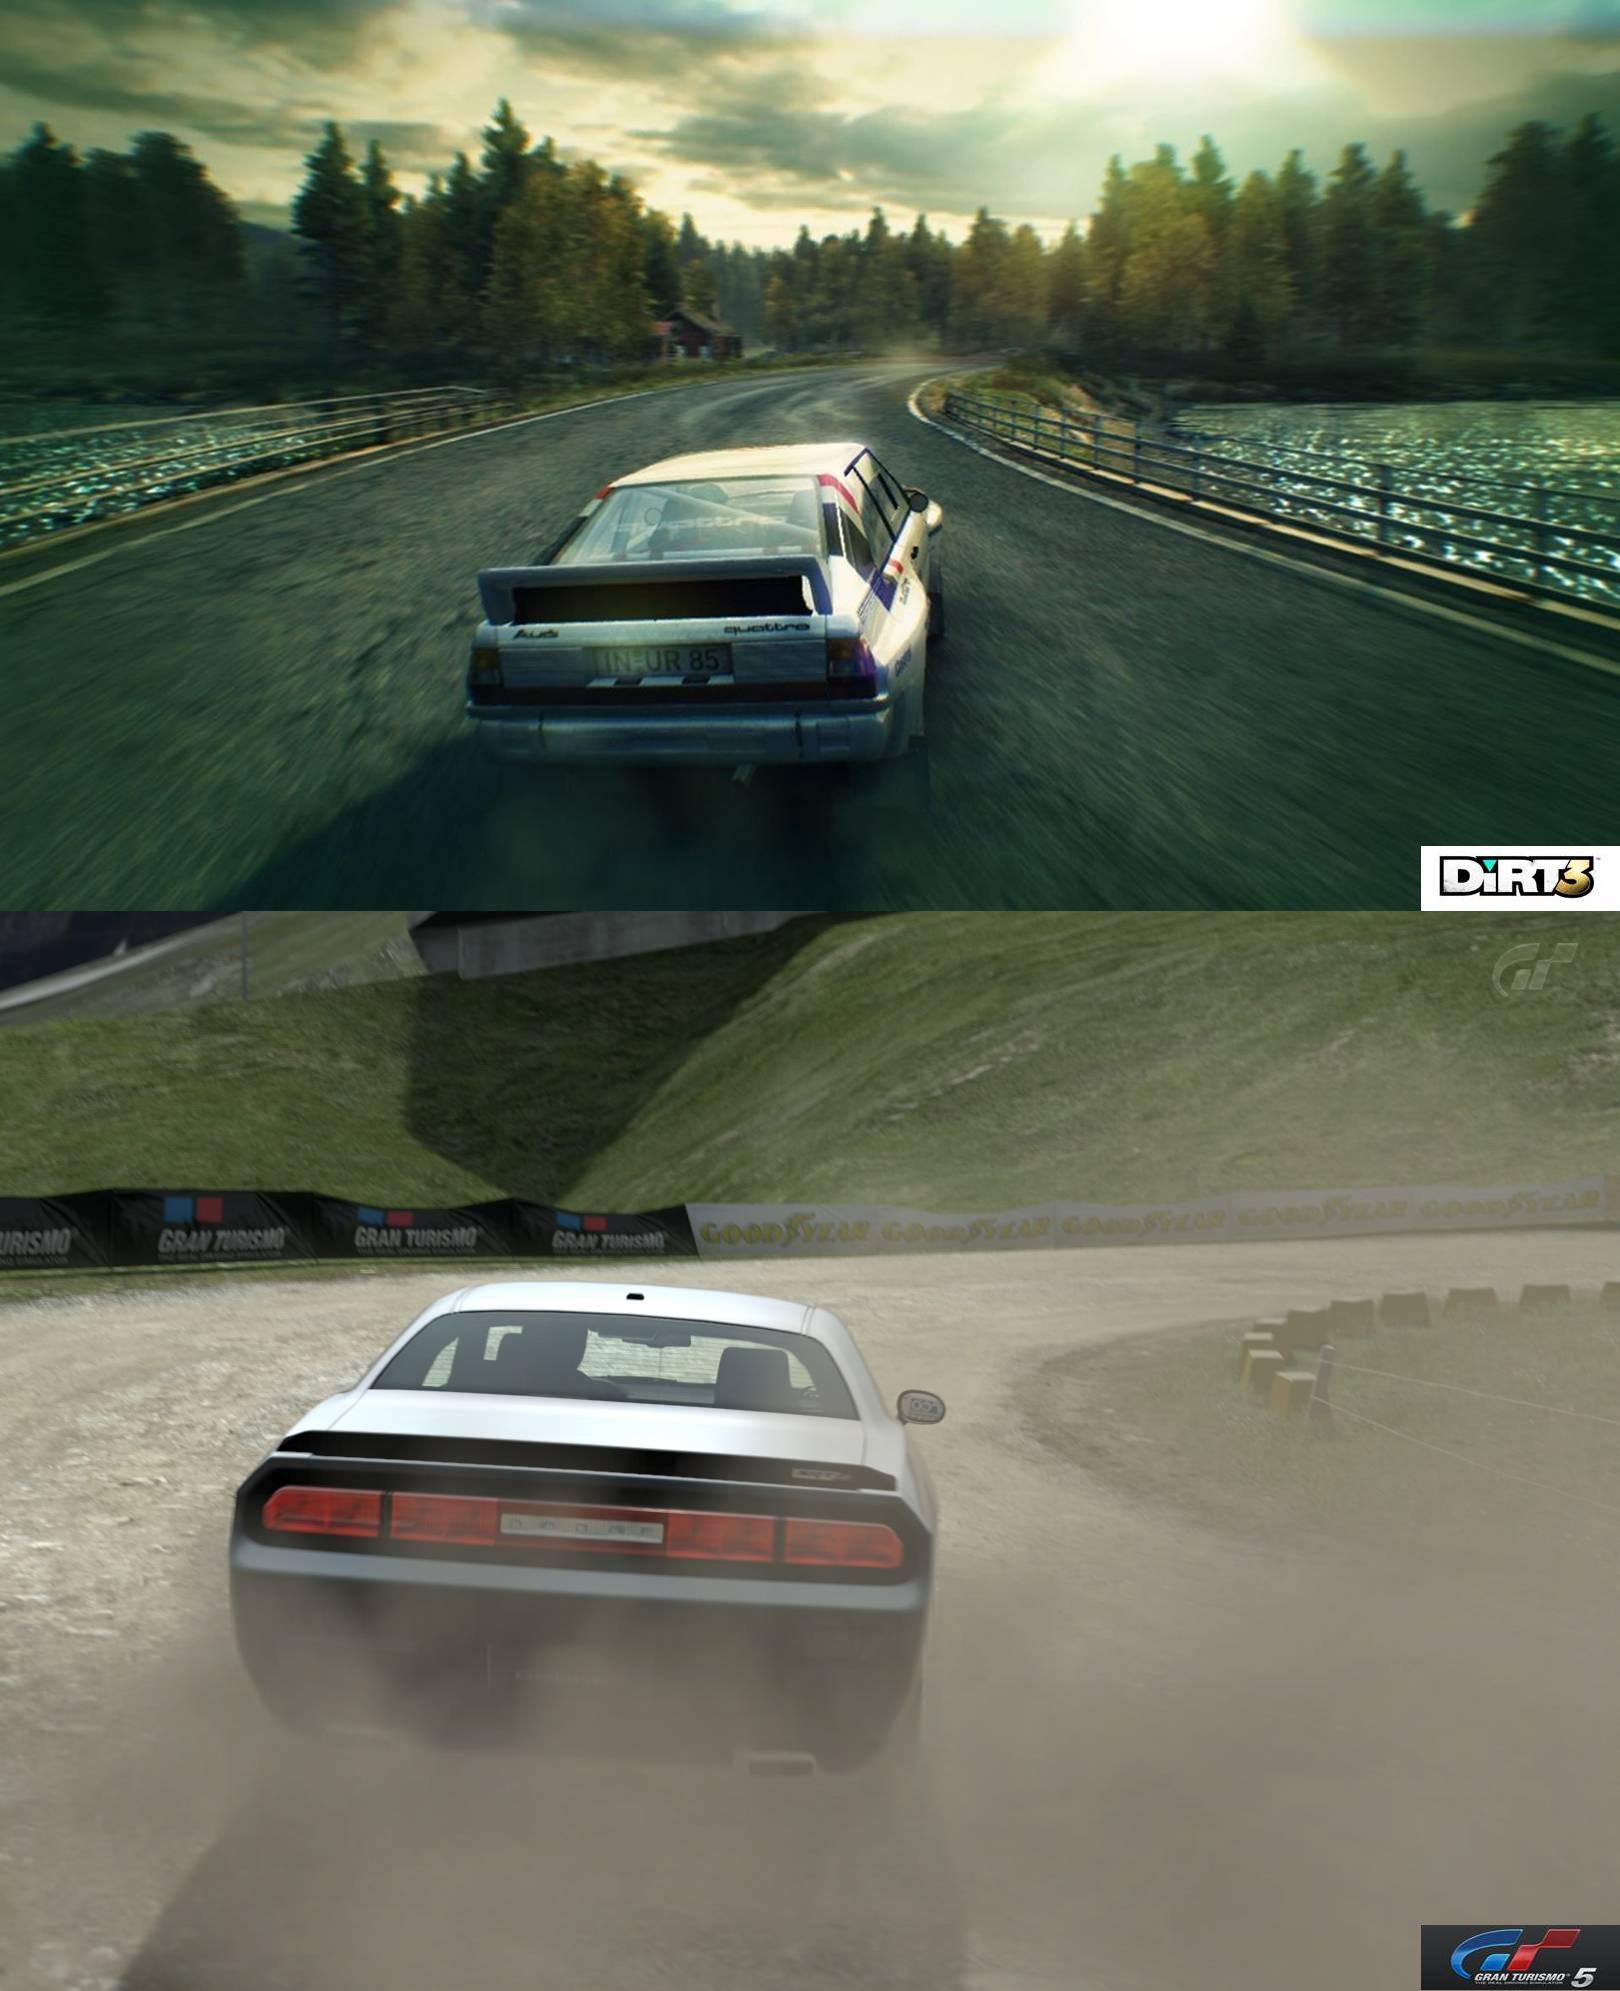 Dirt 3 Gran Turismo 5 Comparison Shots Virtualr Net